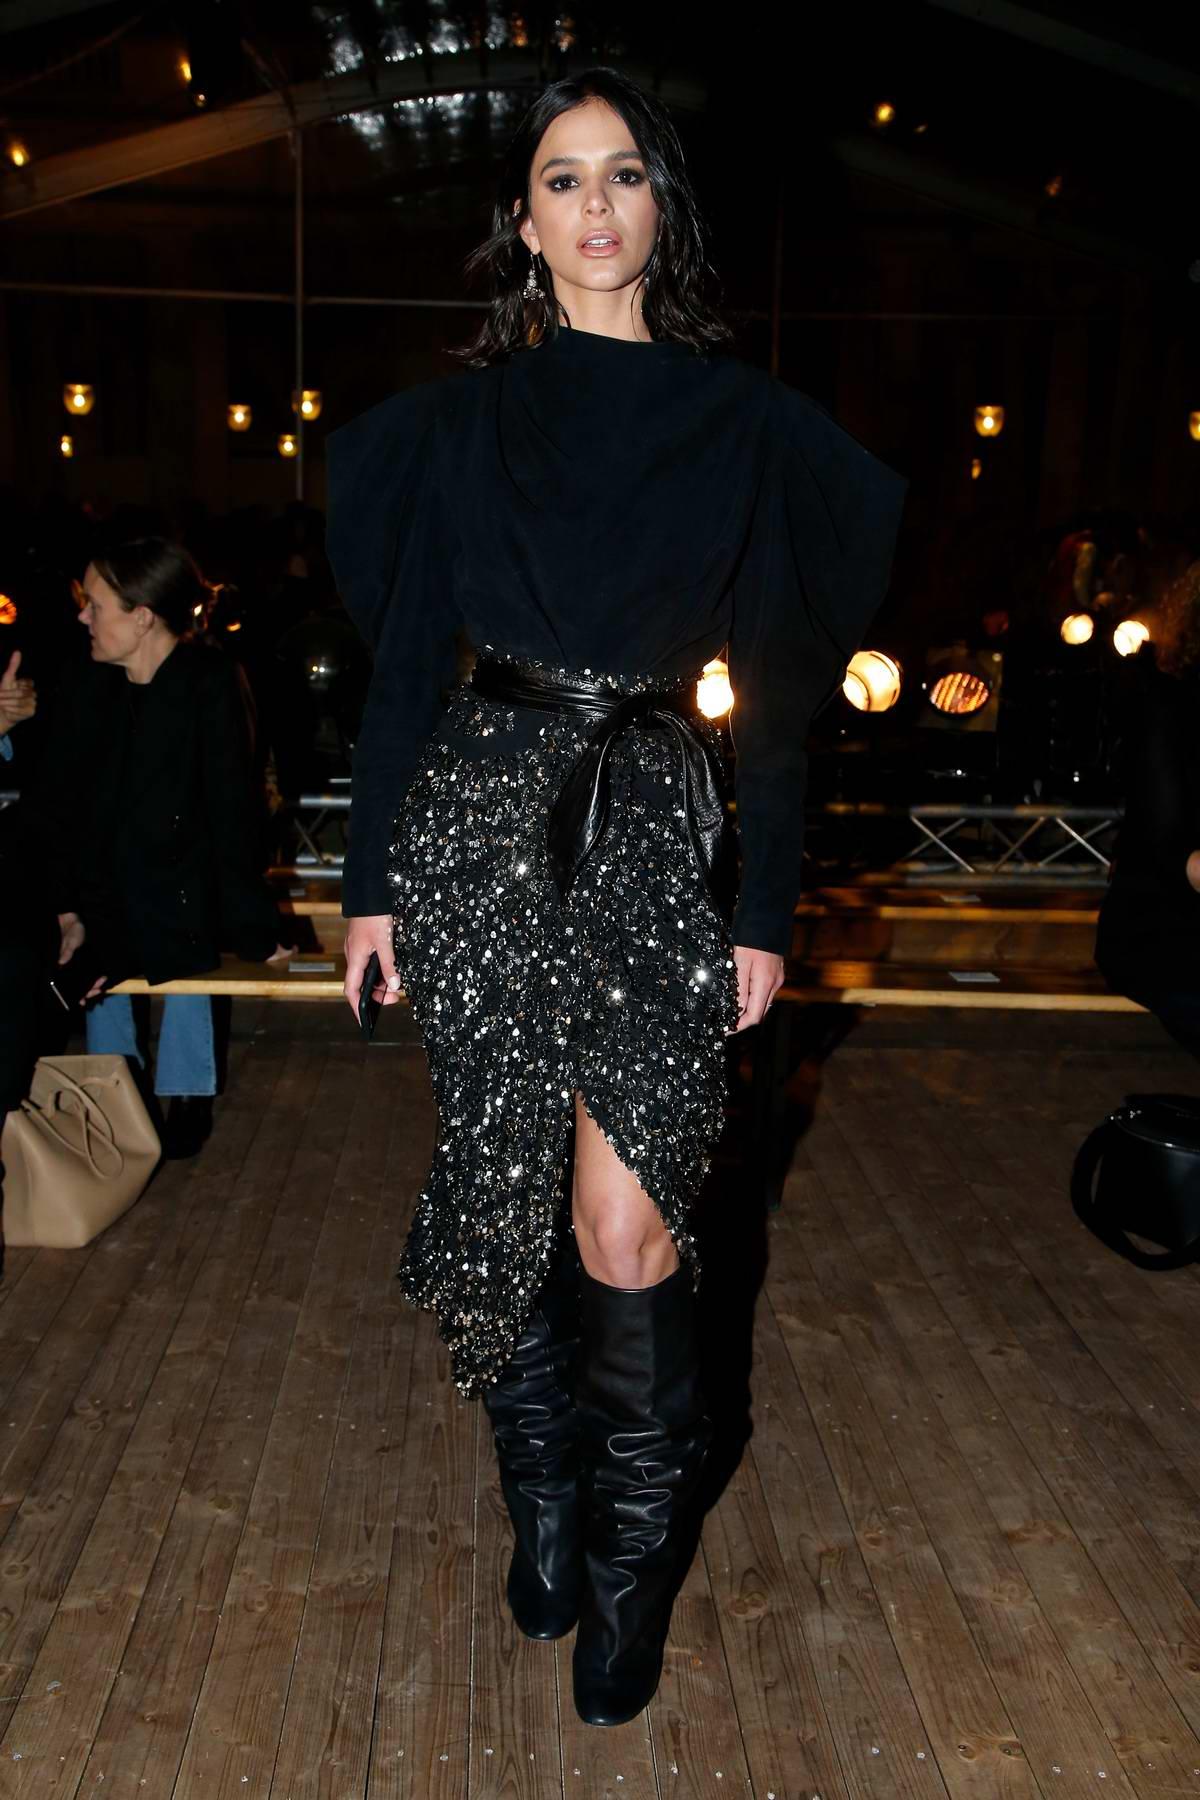 Bruna Marquezine attends the Isabel Marant Spring/Summer 2020 show during Paris Fashion Week in Paris, France